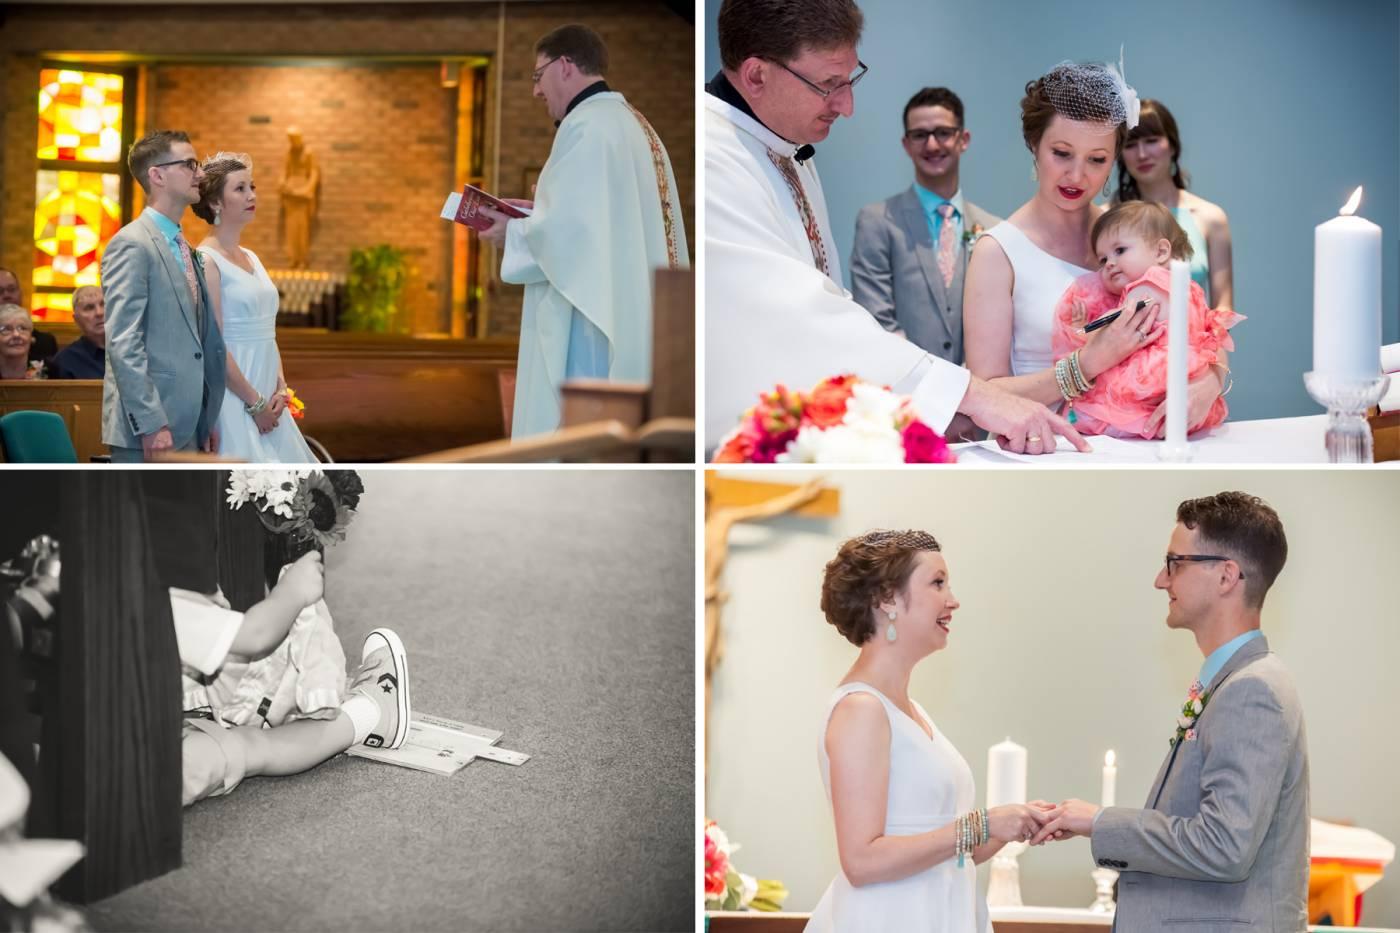 Ceremony Precious Blood Church Windsor Tanya Sinnett